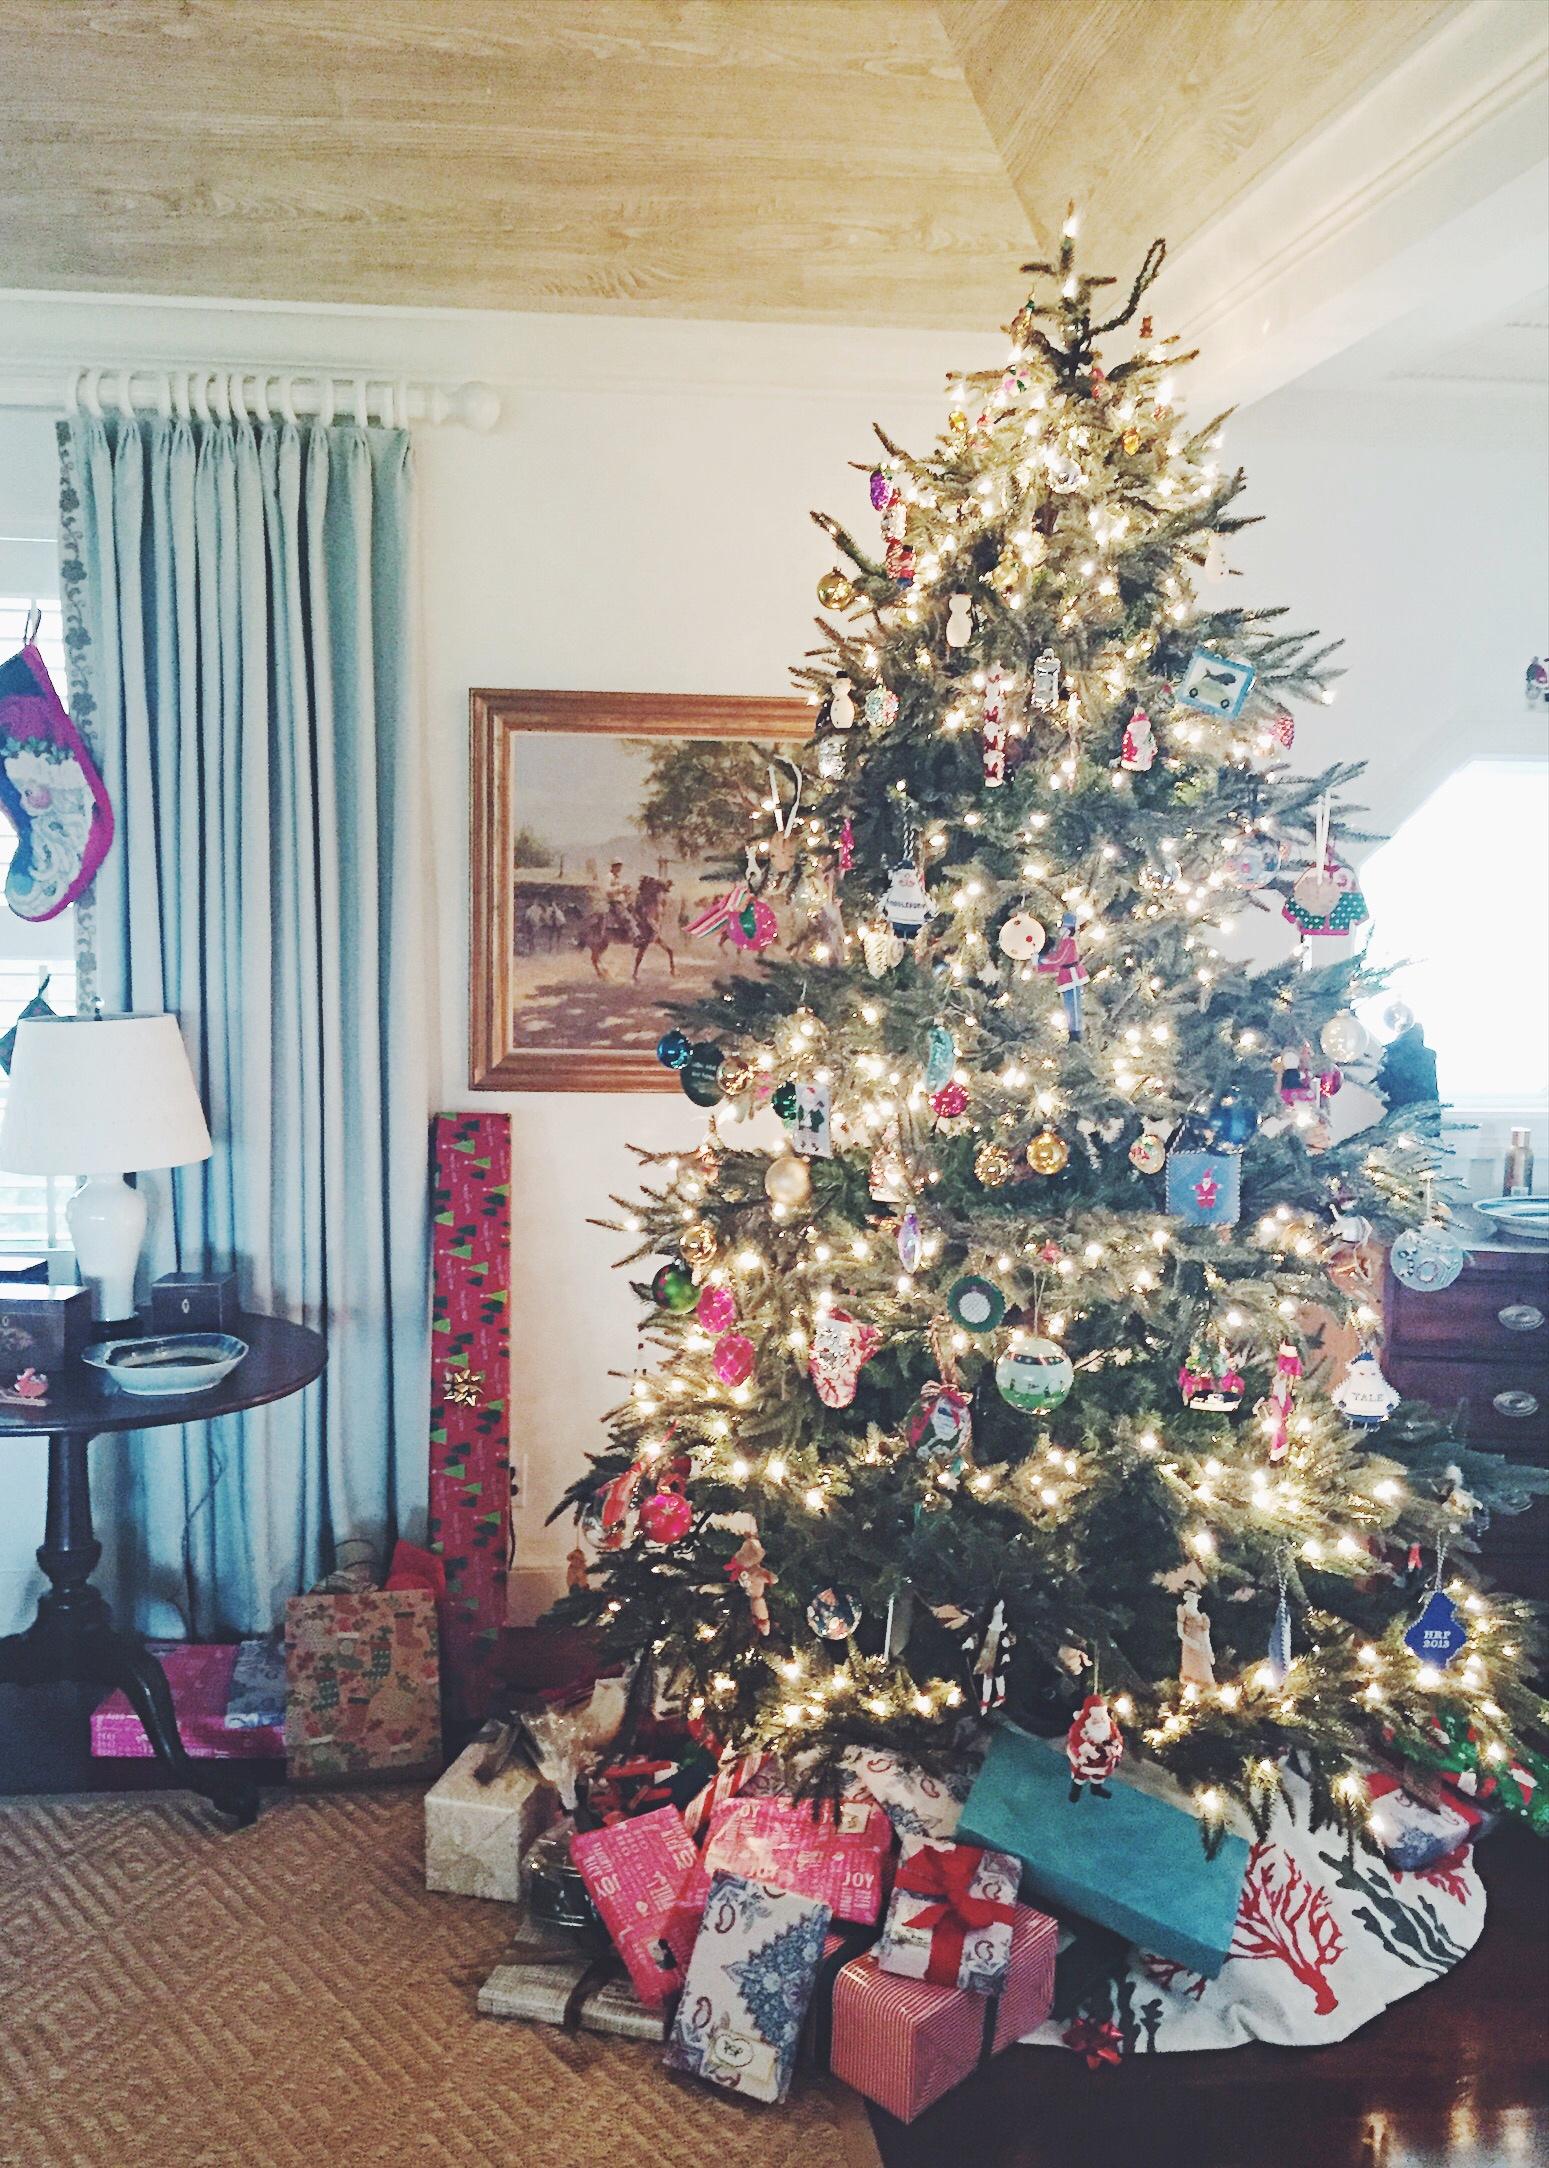 Christmas Tree Decorations - via Simply Elegant Blog